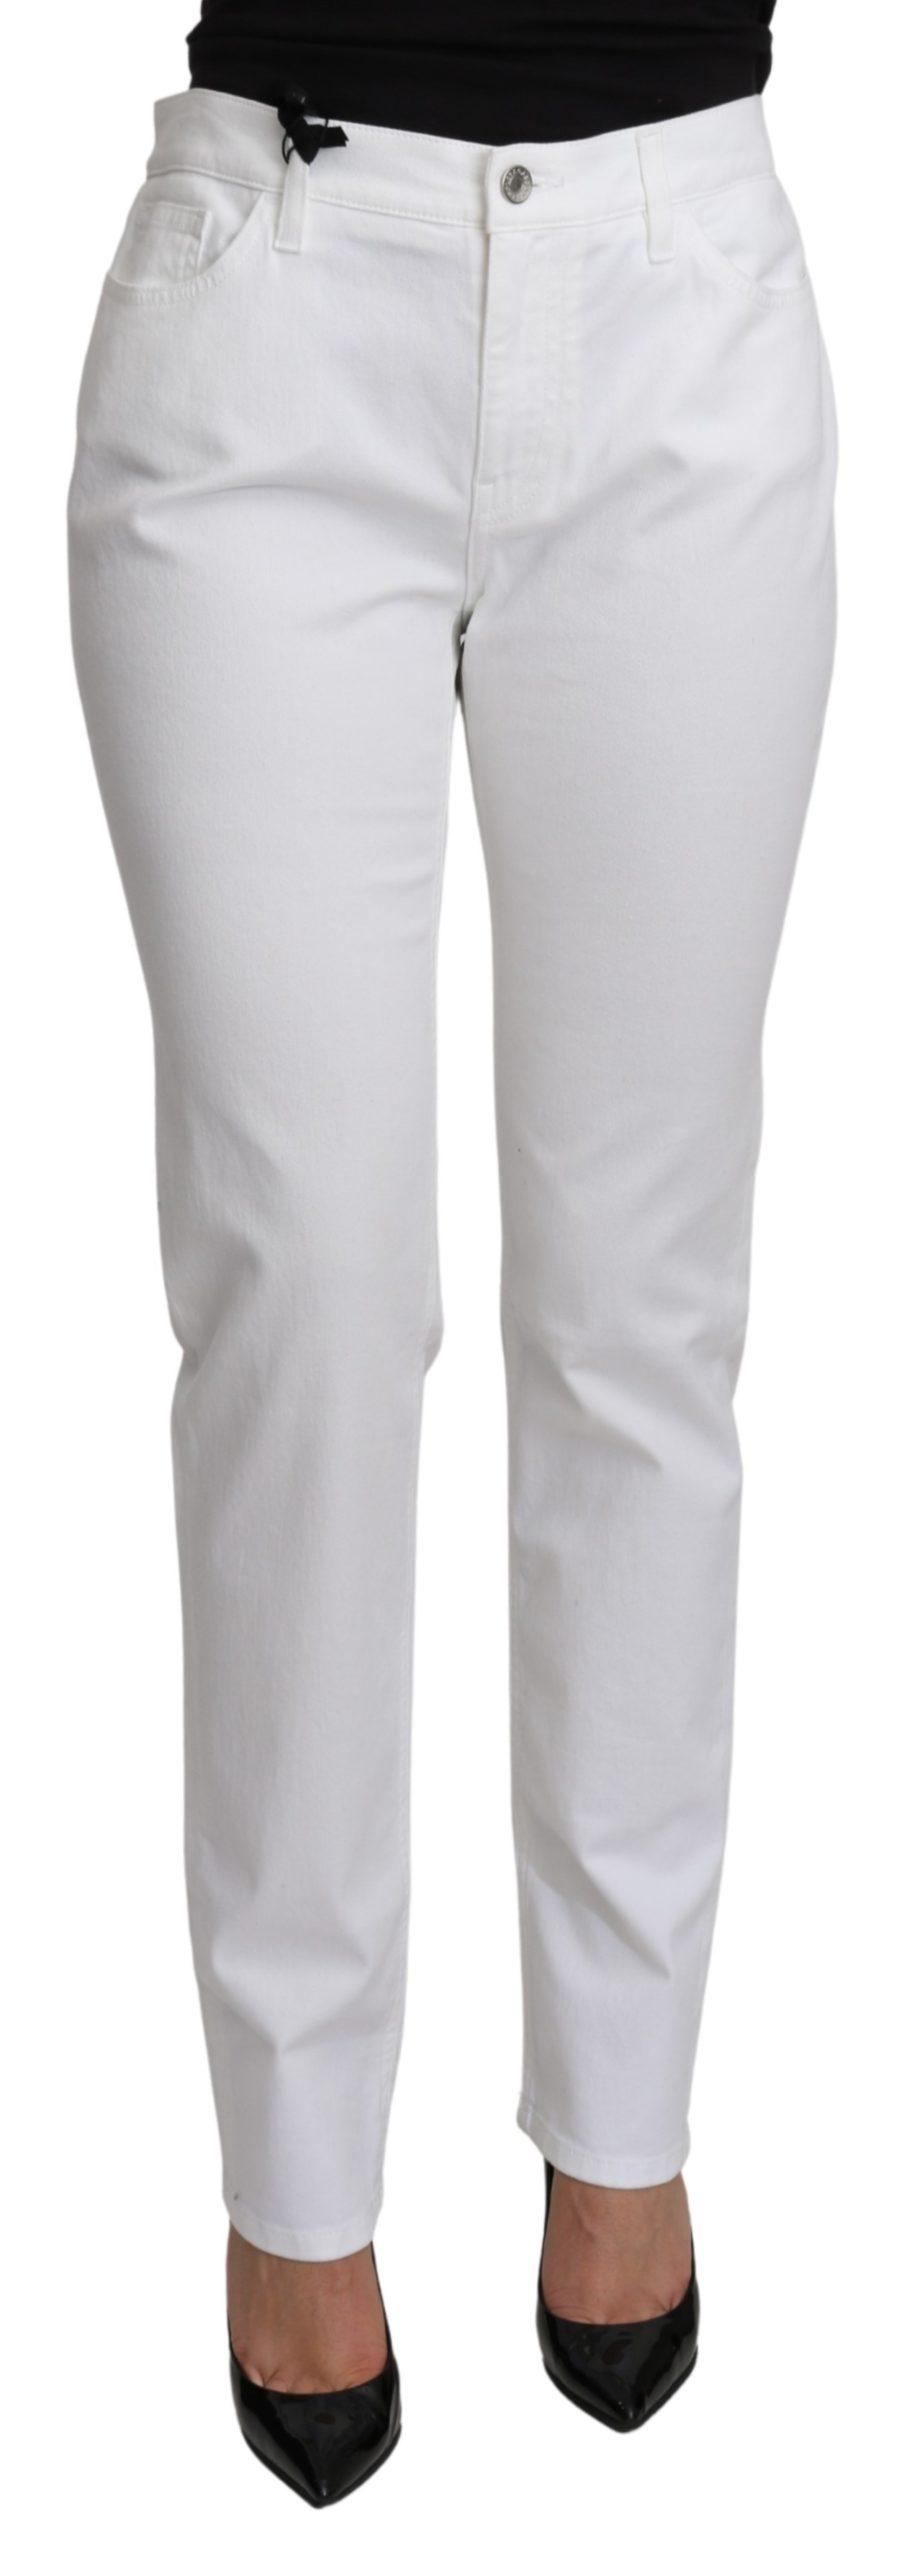 Dolce & Gabbana Women's Mid Waist Denim Cotton Jeans White PAN71119 - IT48|XXL